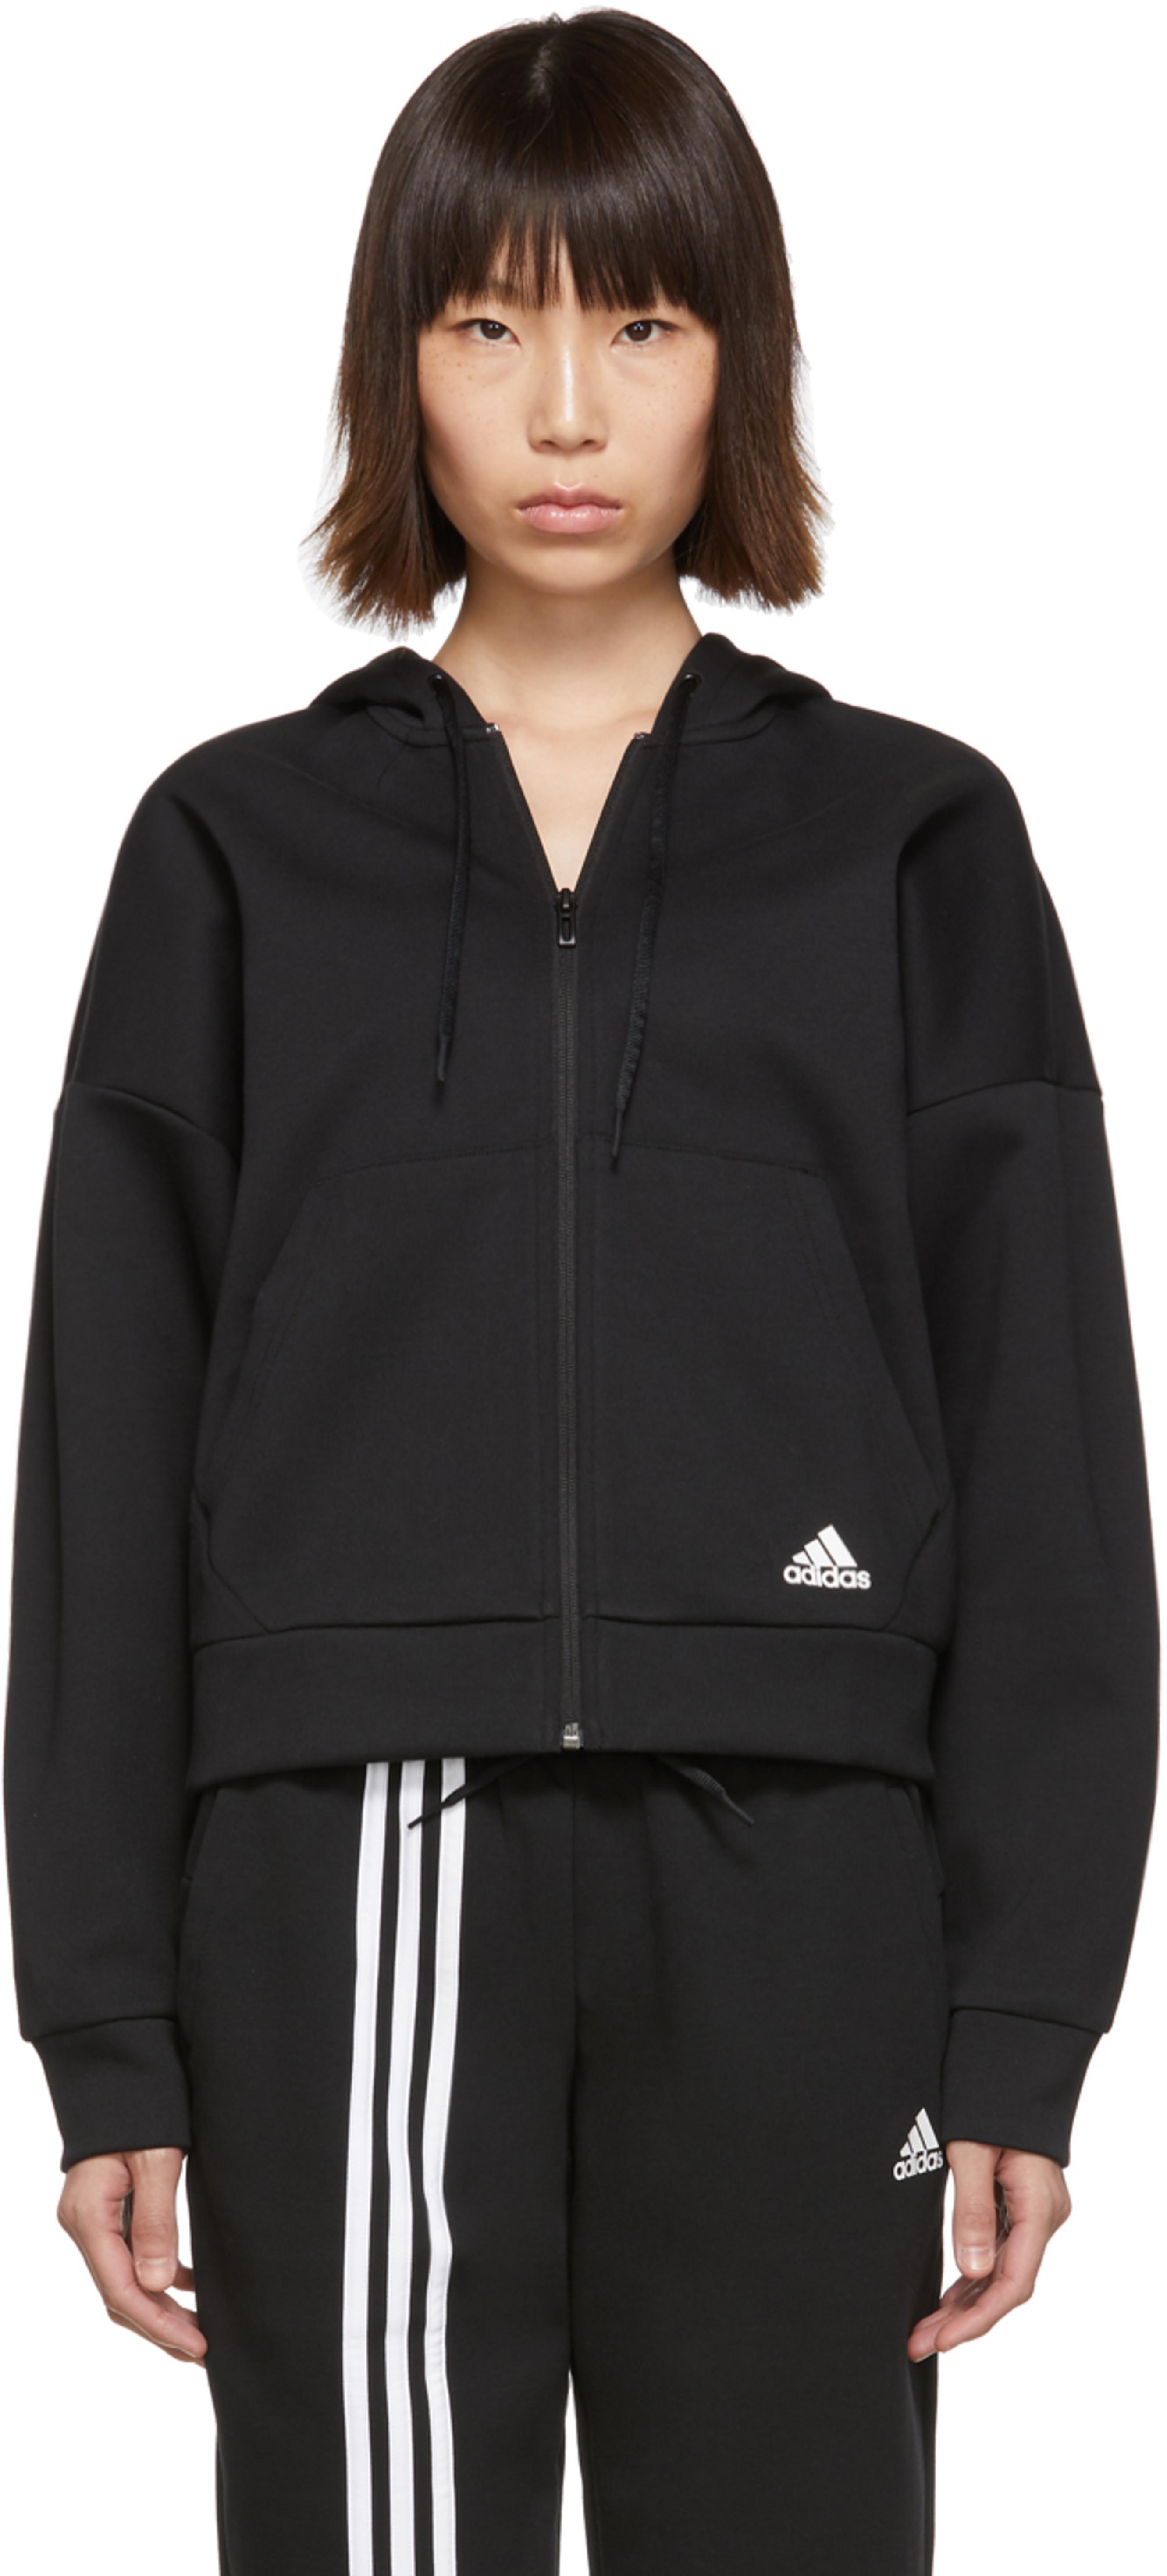 748d23dca2 Adidas Originals for Women SS19 Collection | SSENSE